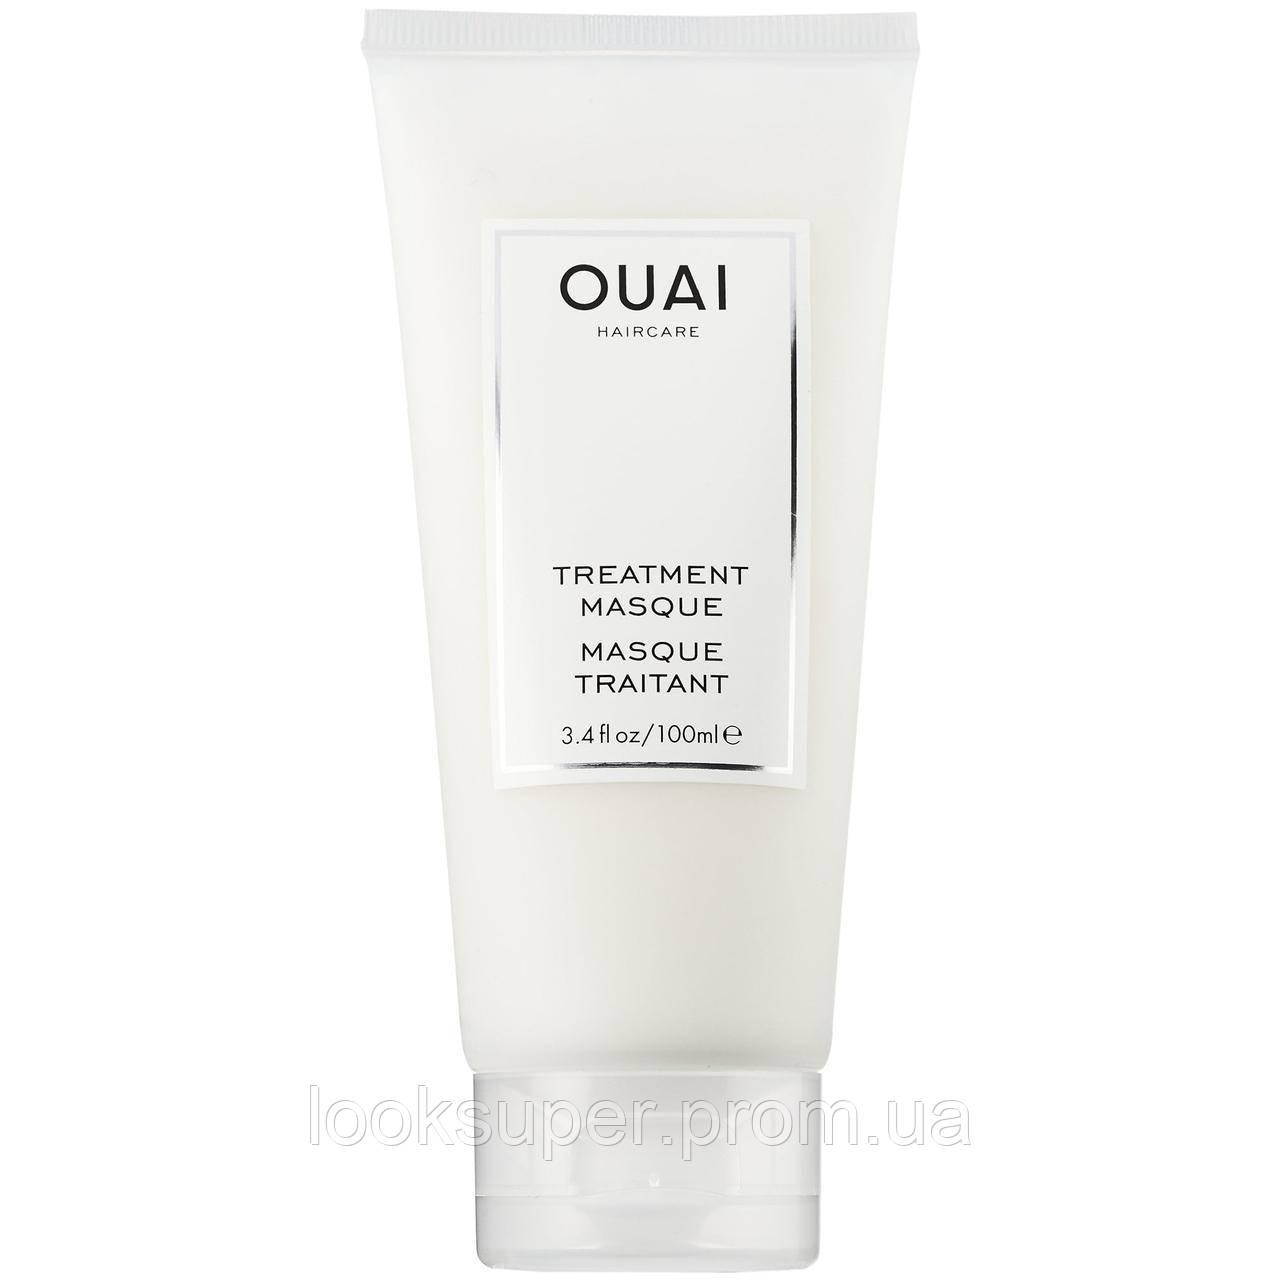 Восстанавливающая лечебная маска OUAI Treatment Masque 100ml